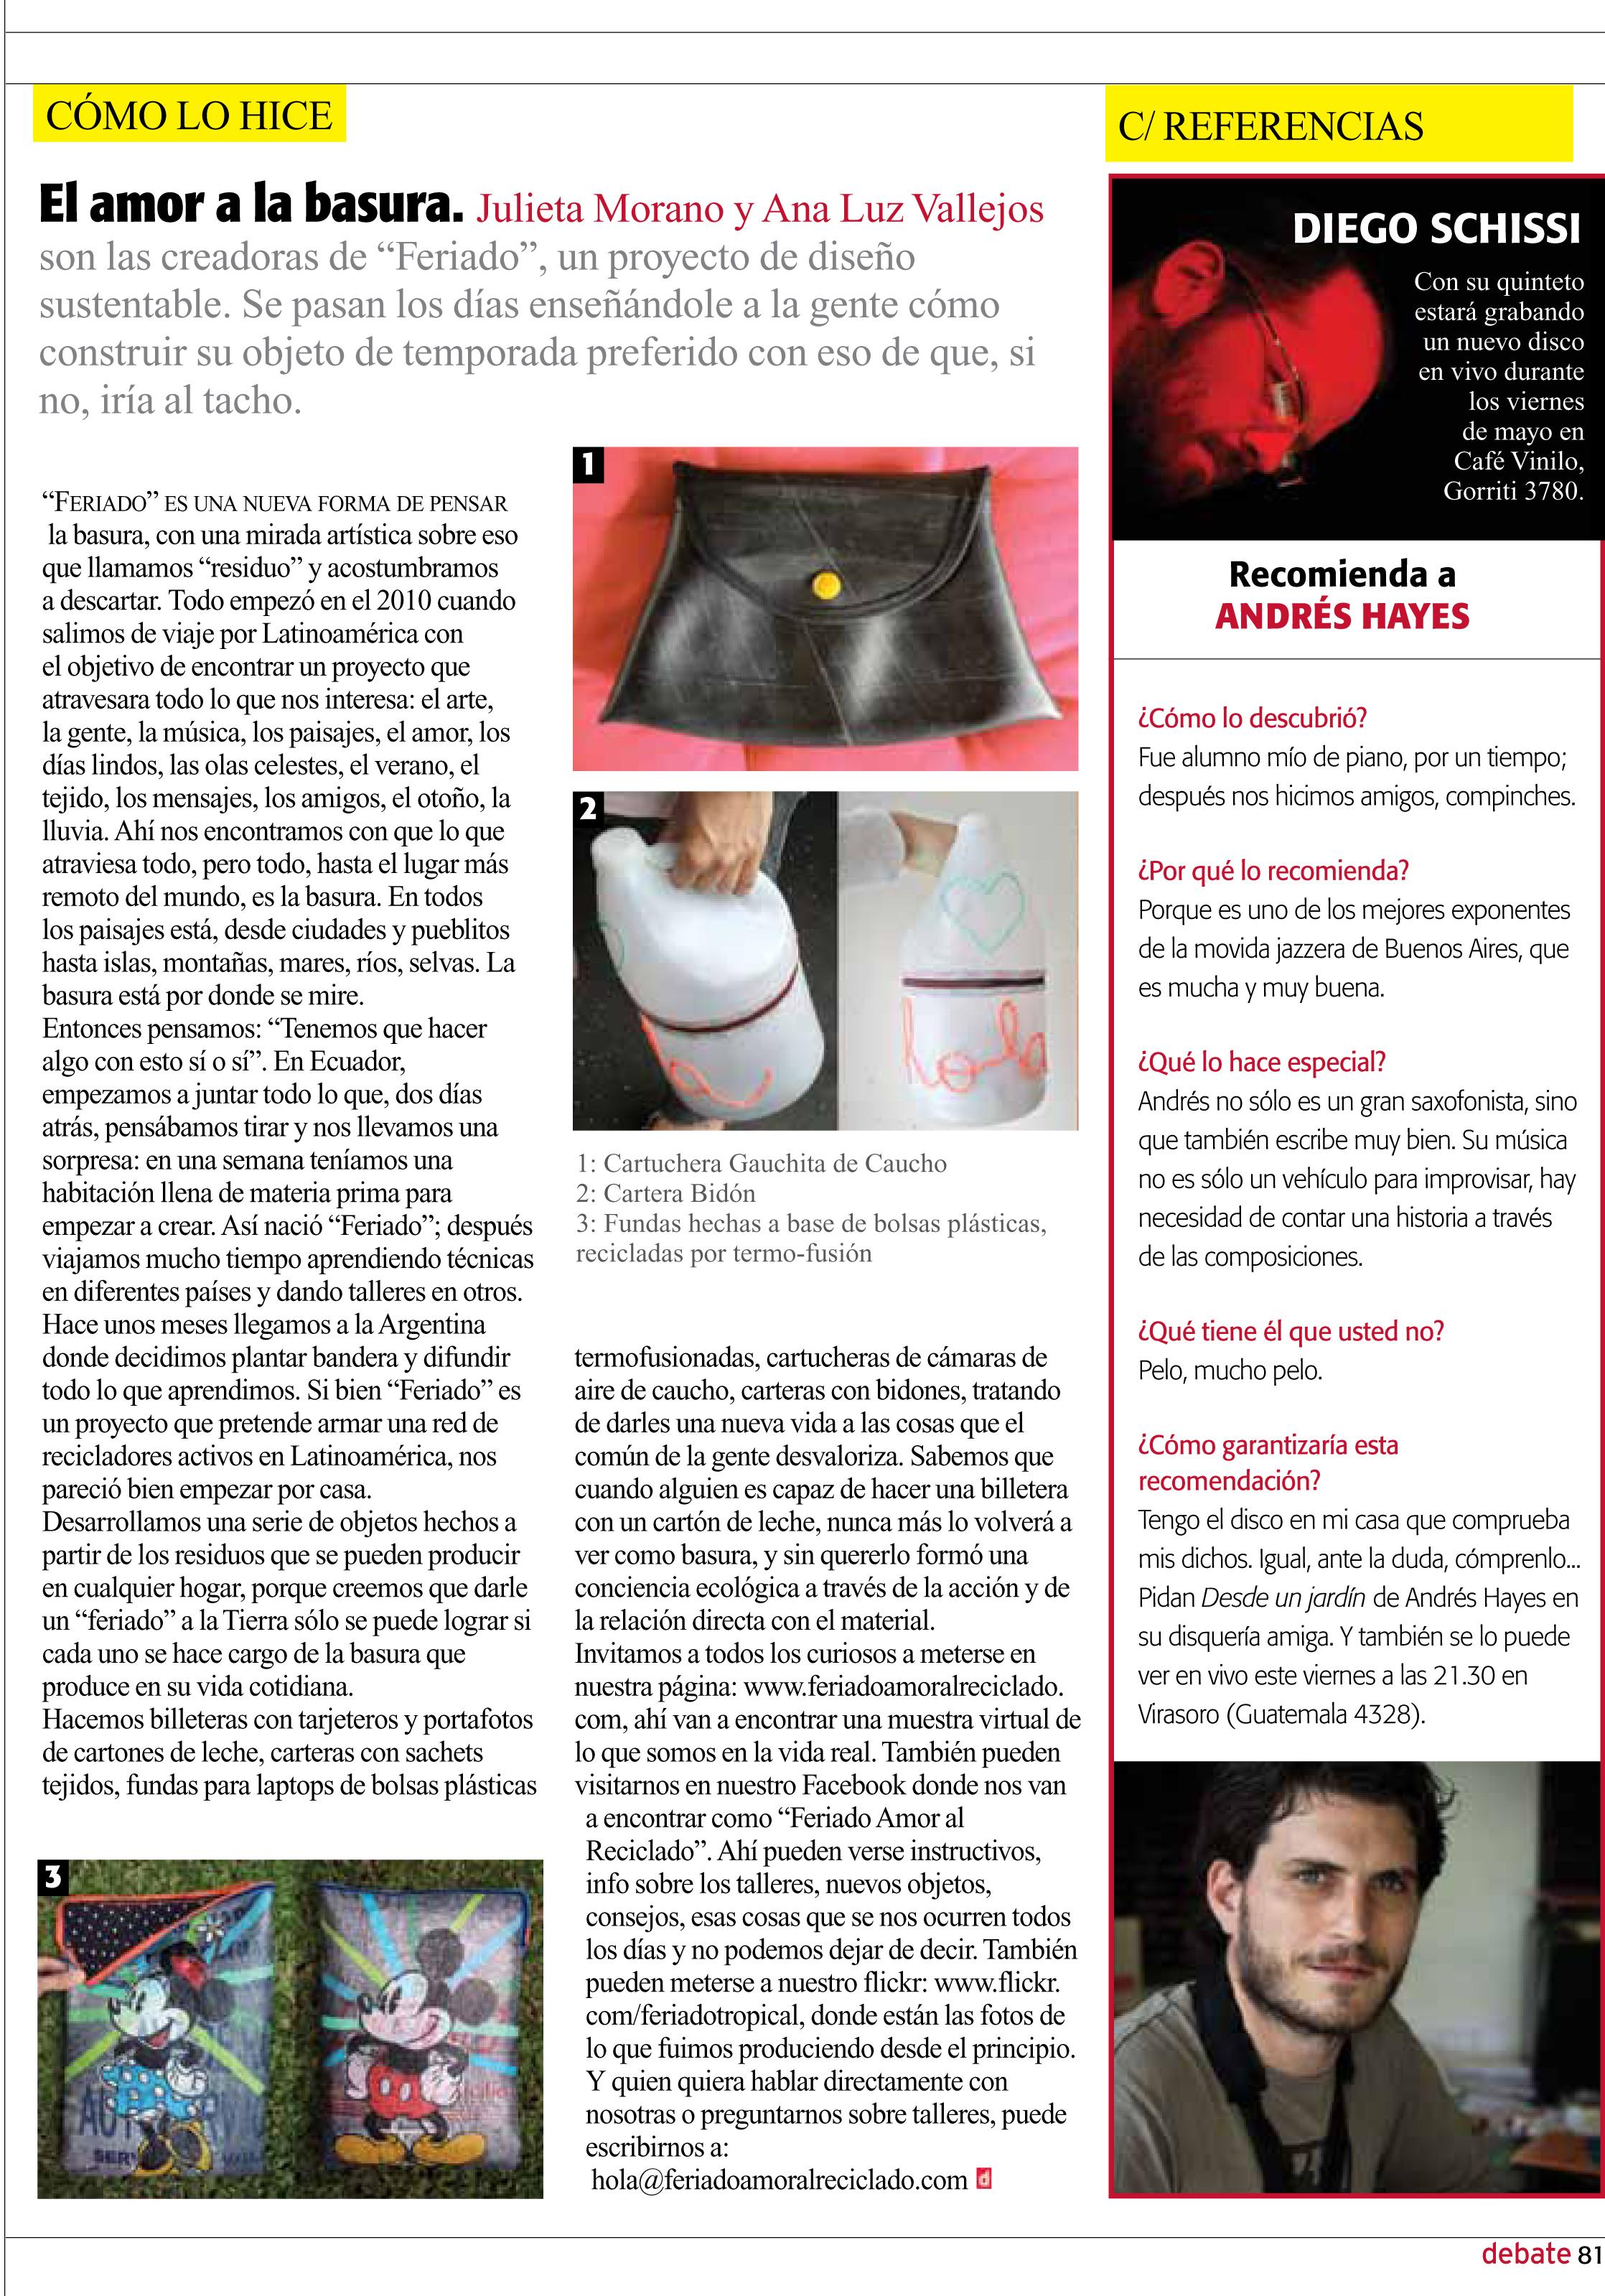 1 Revista Debate 7 abril 2012.jpg